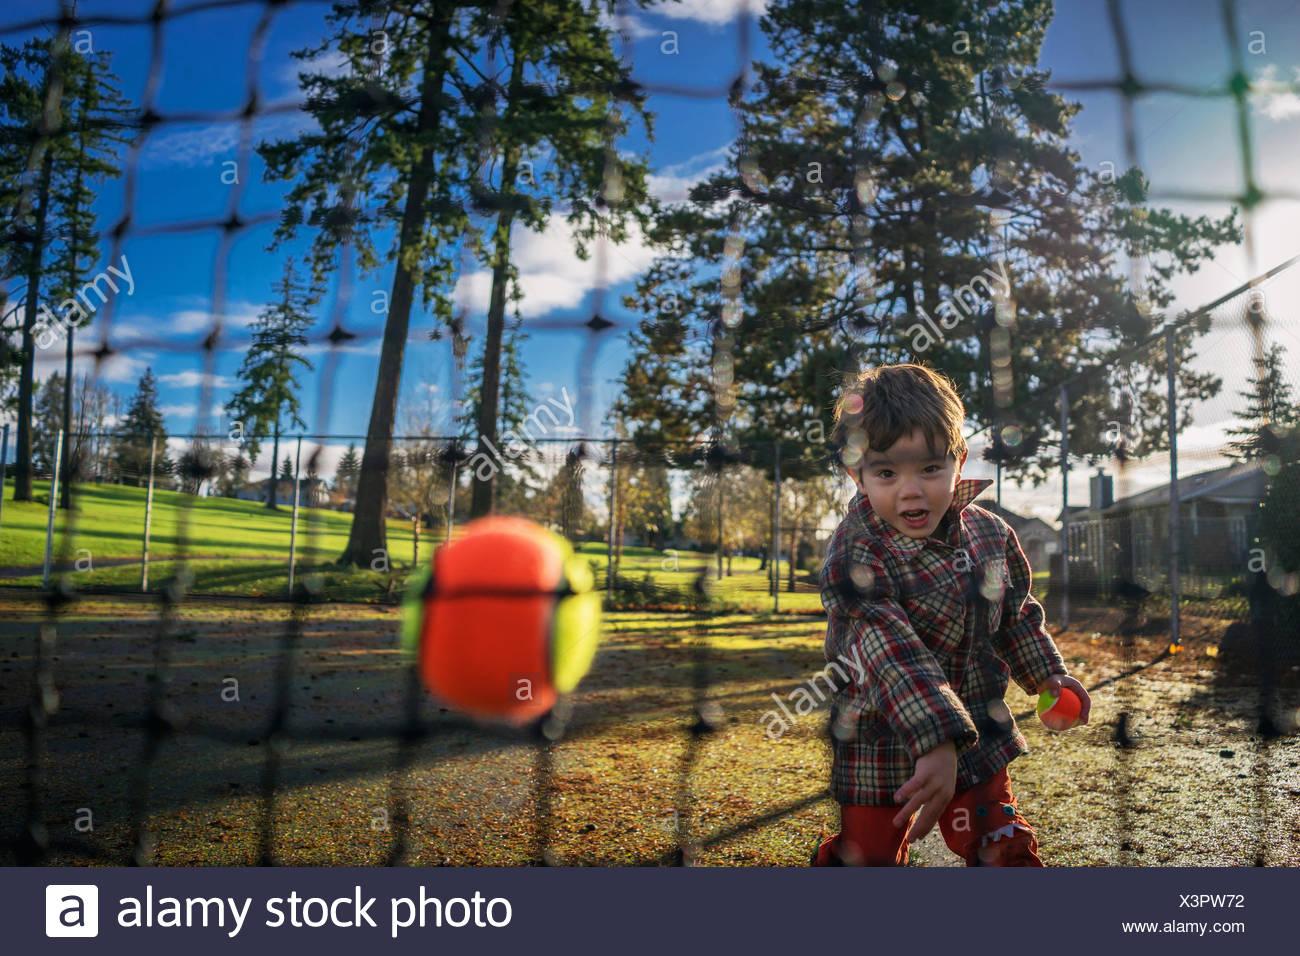 Joven lanzando pelota de tenis en una red Imagen De Stock